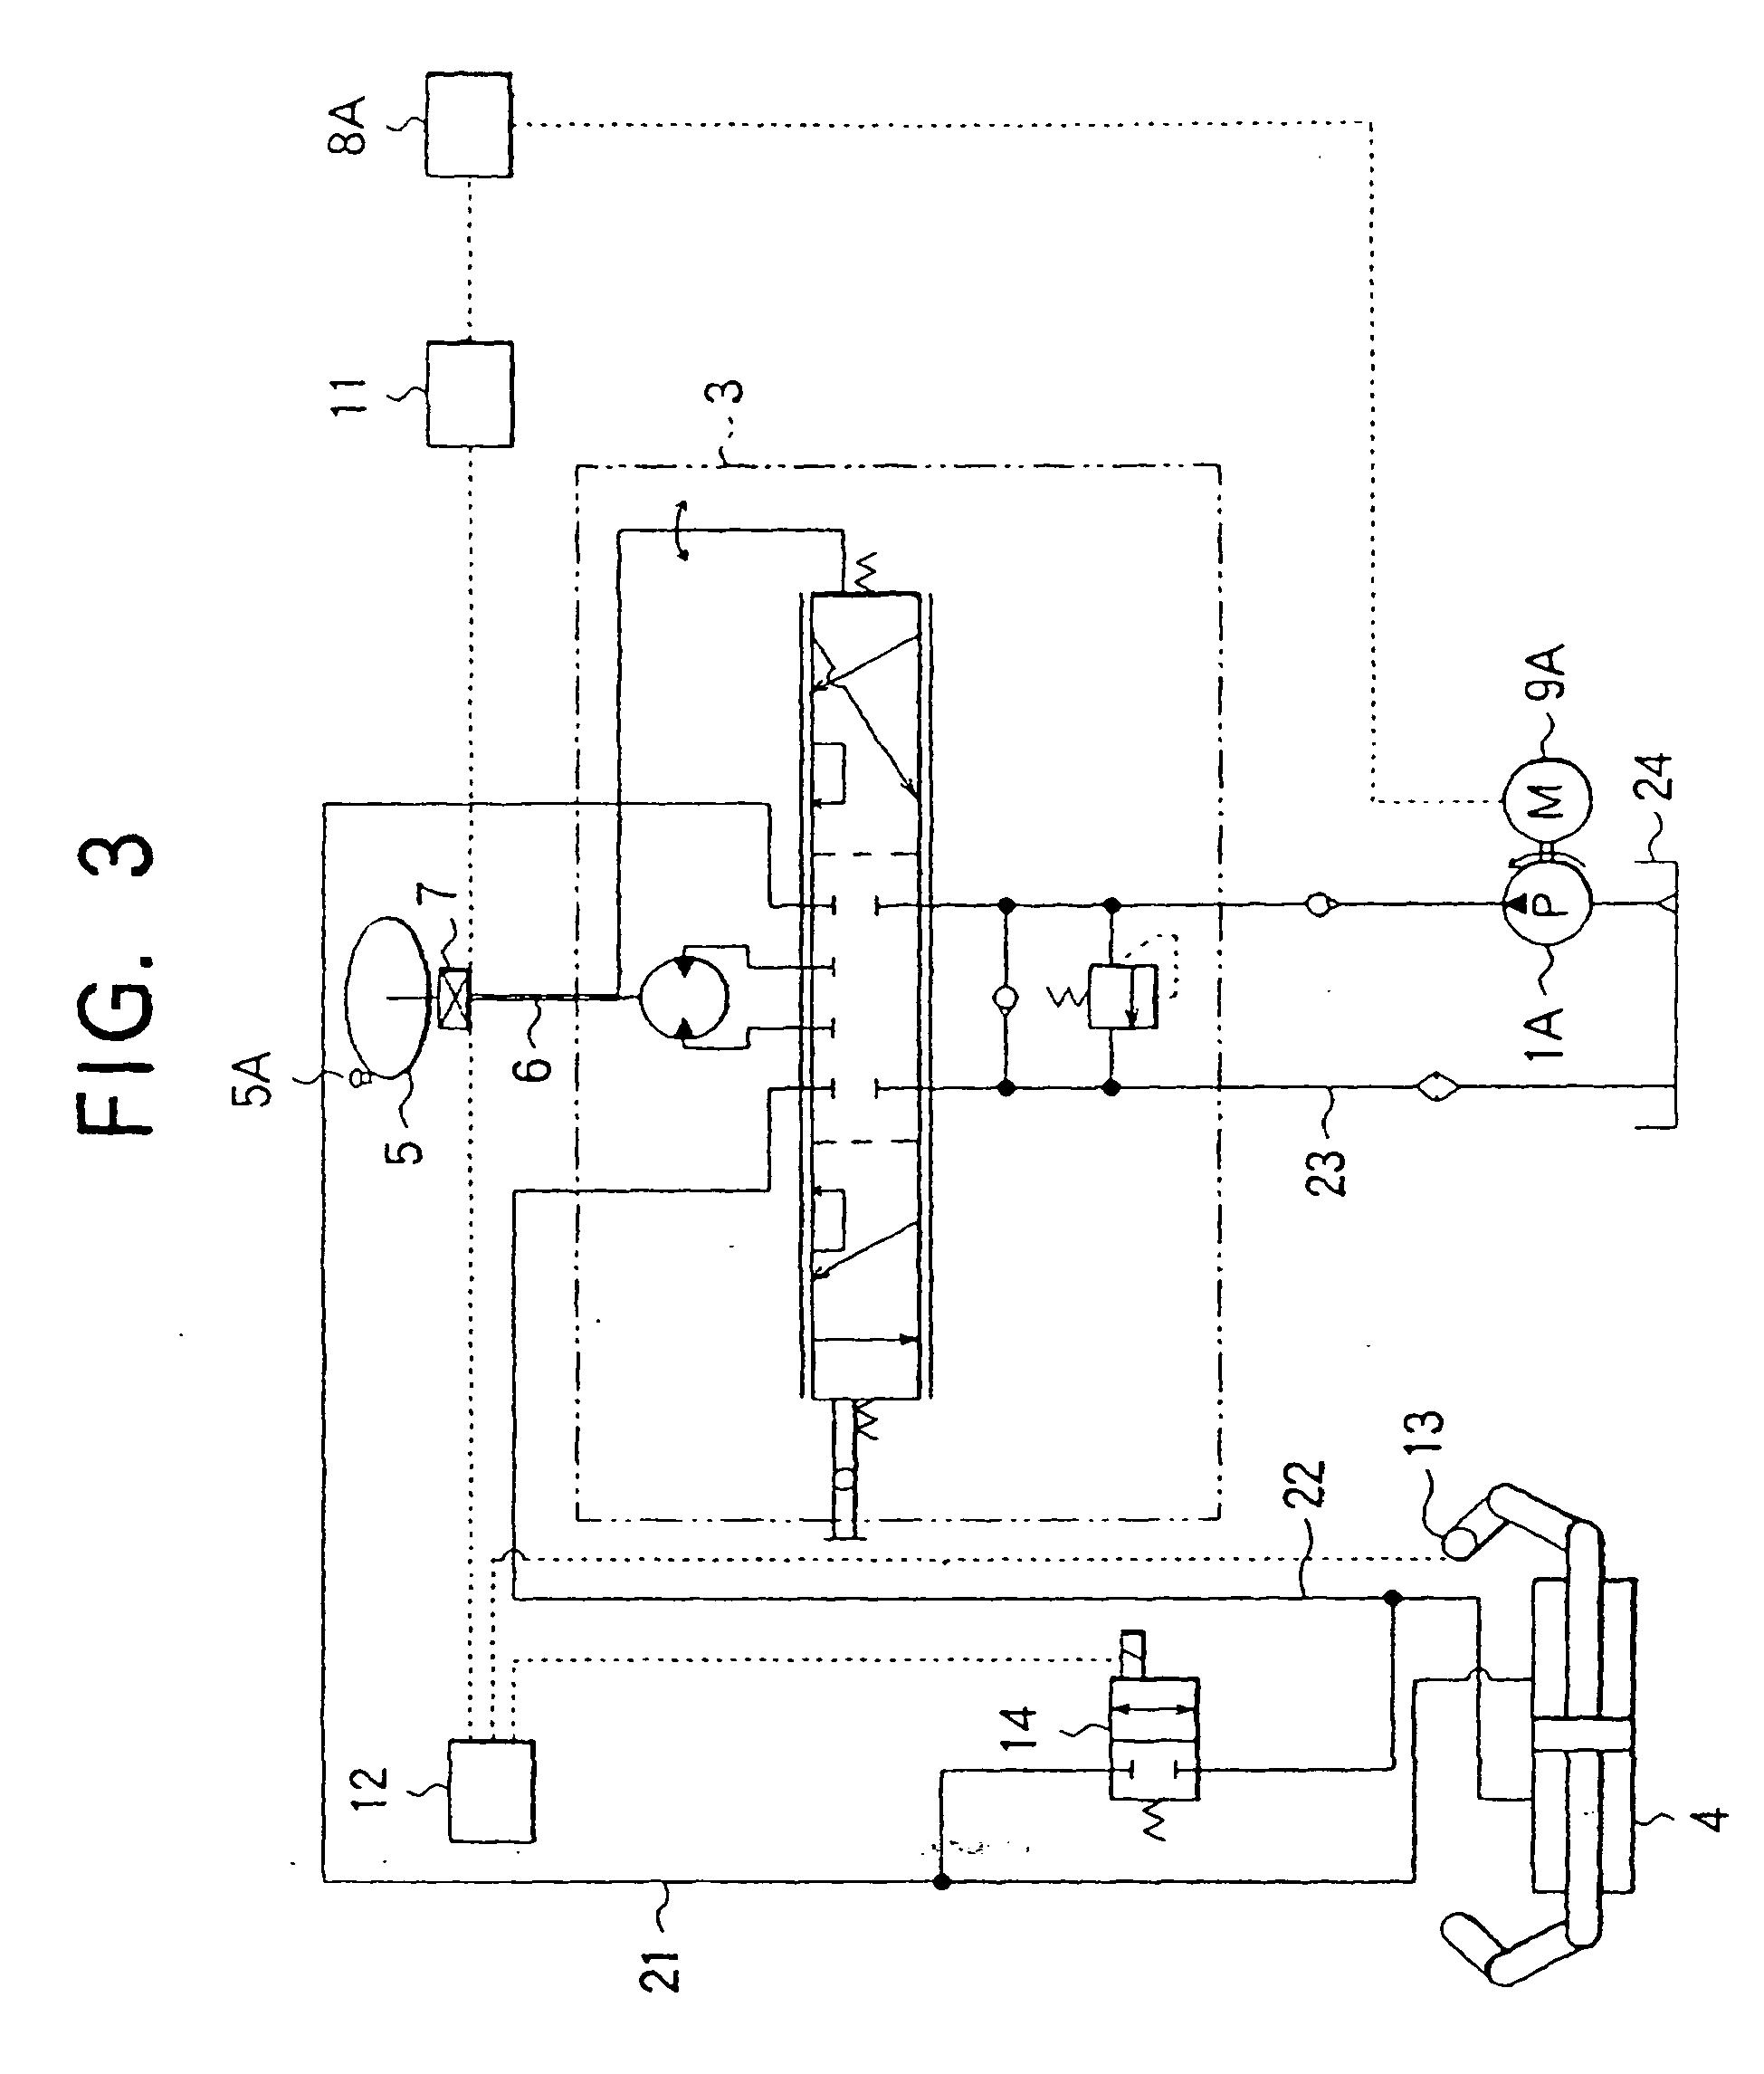 clark forklift wiring diagram 1993 nissan 240sx fuel pump hydraulic free engine image